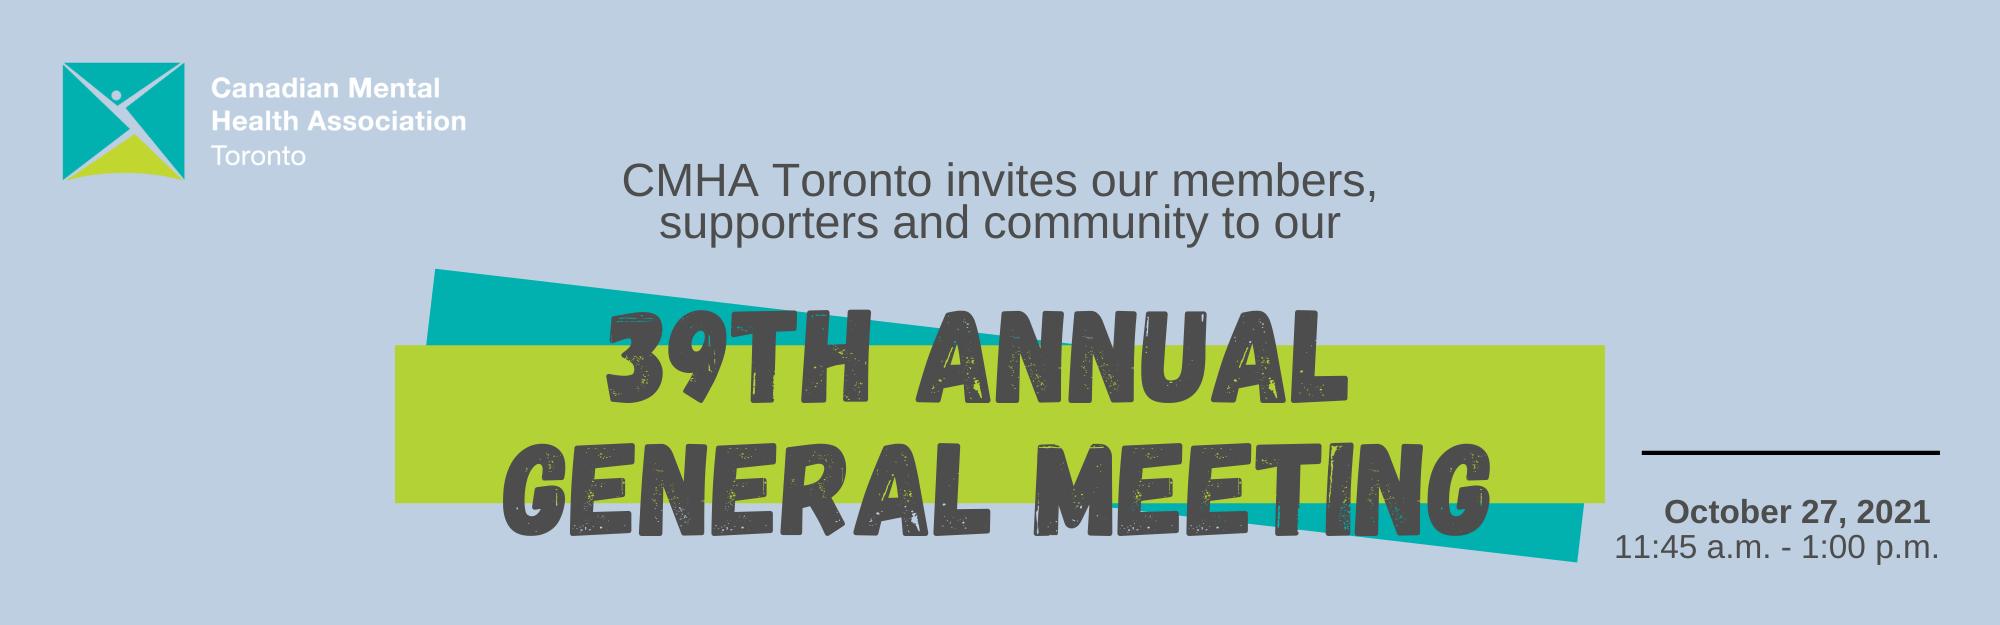 CMHA Toronto 2021 Annual General Meeting